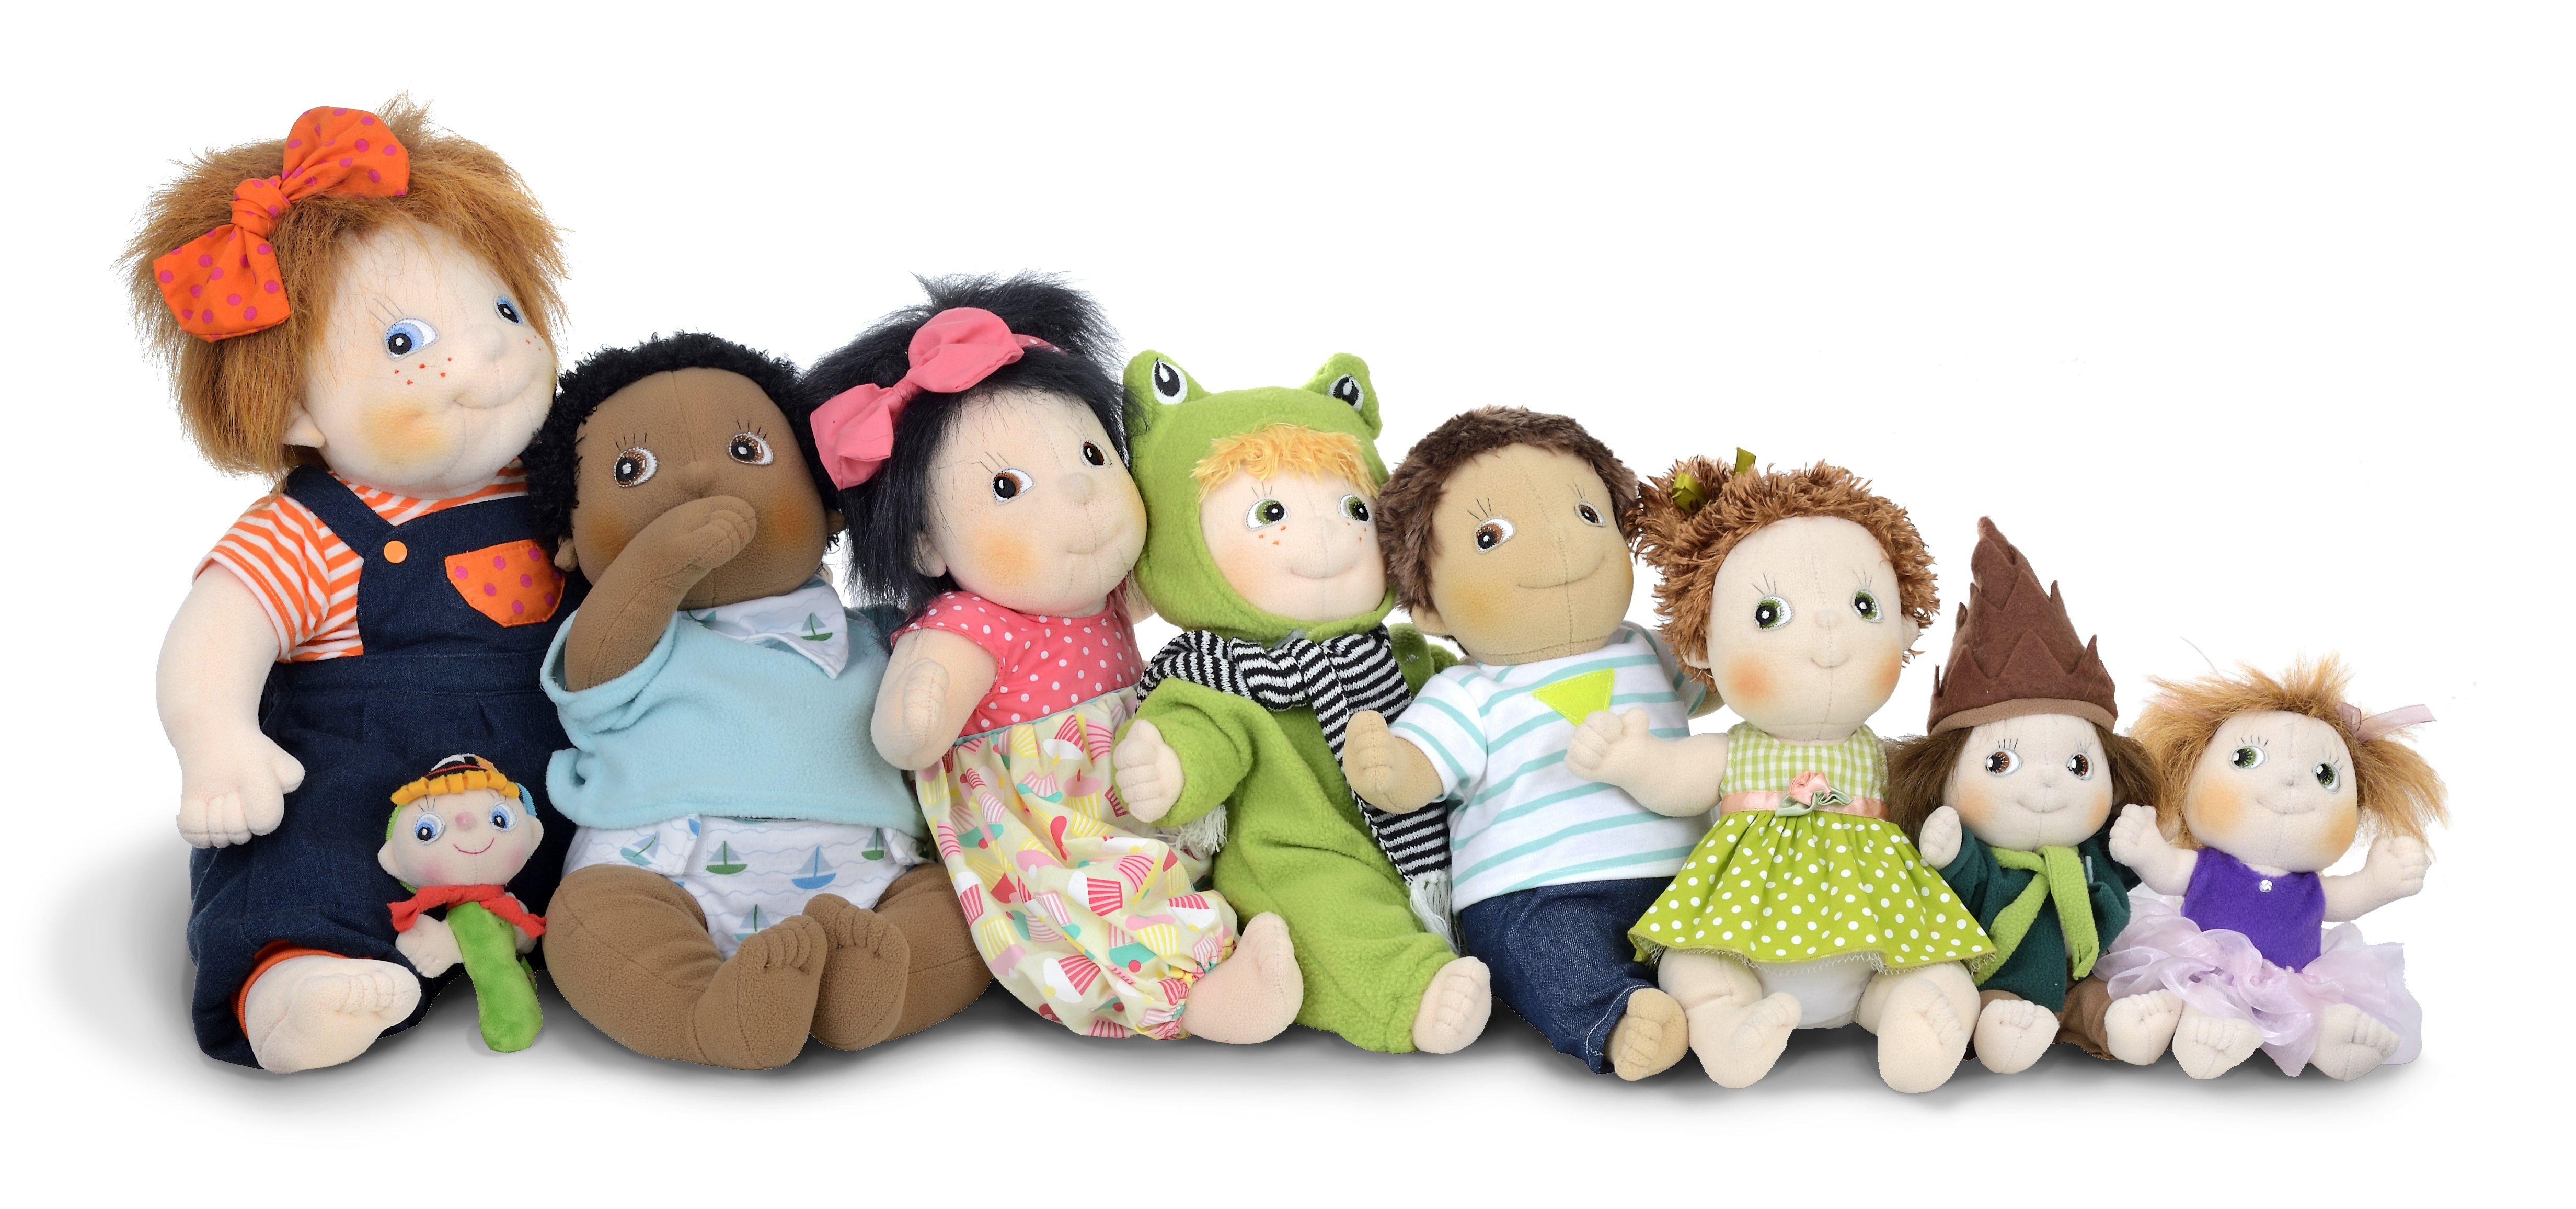 Familia de muñecas Rubens Barn